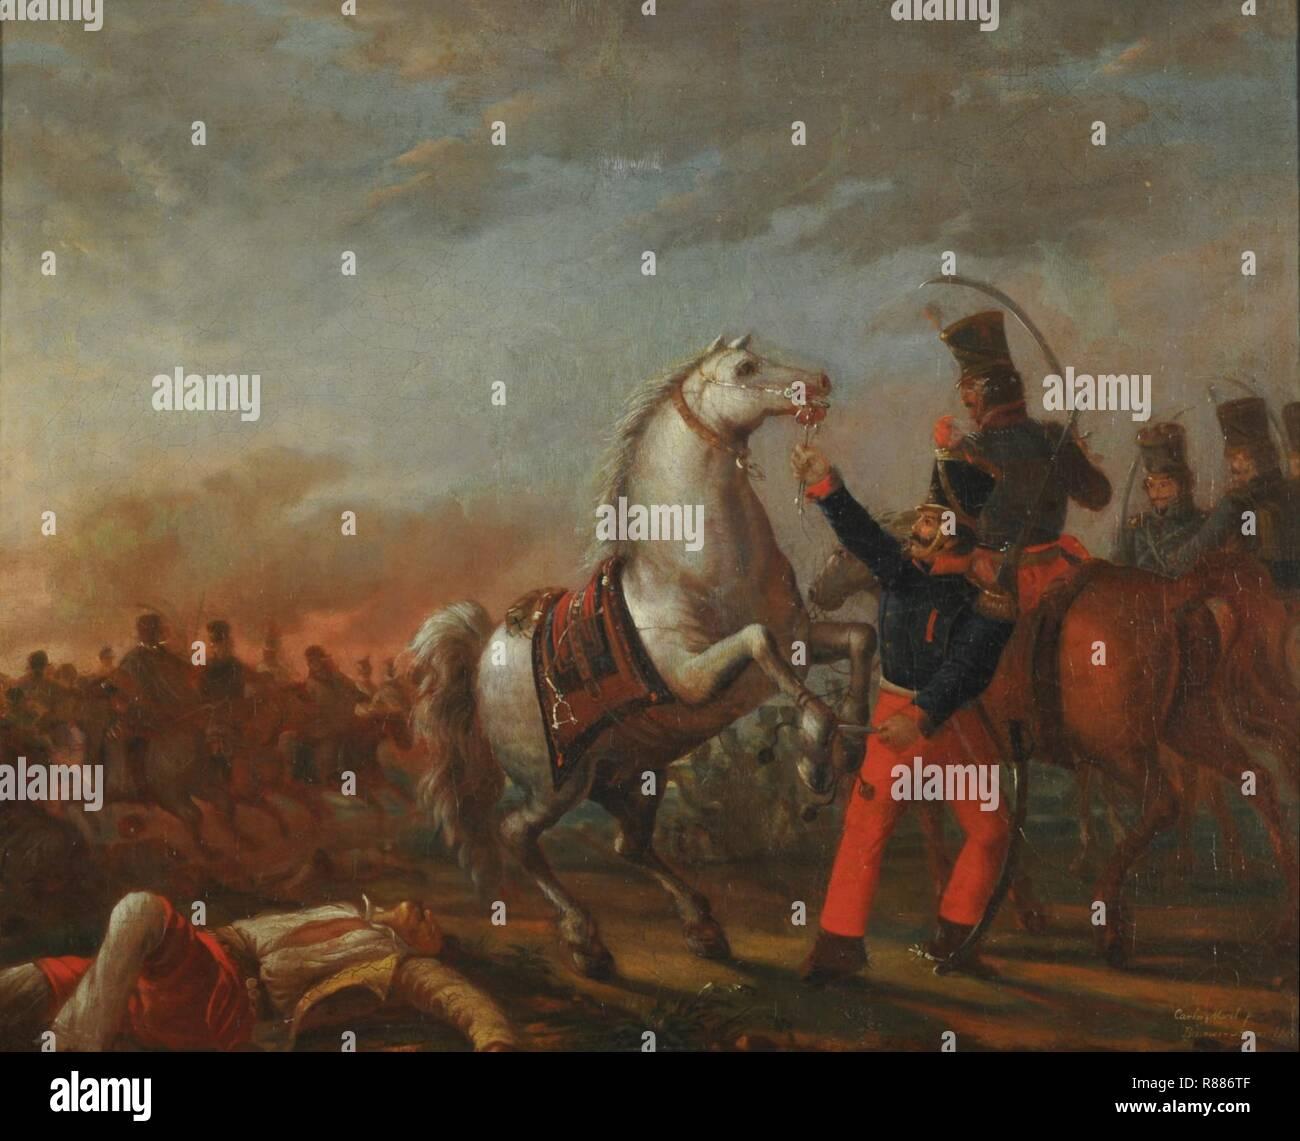 Carga de caballería - Carlos Morel. - Stock Image